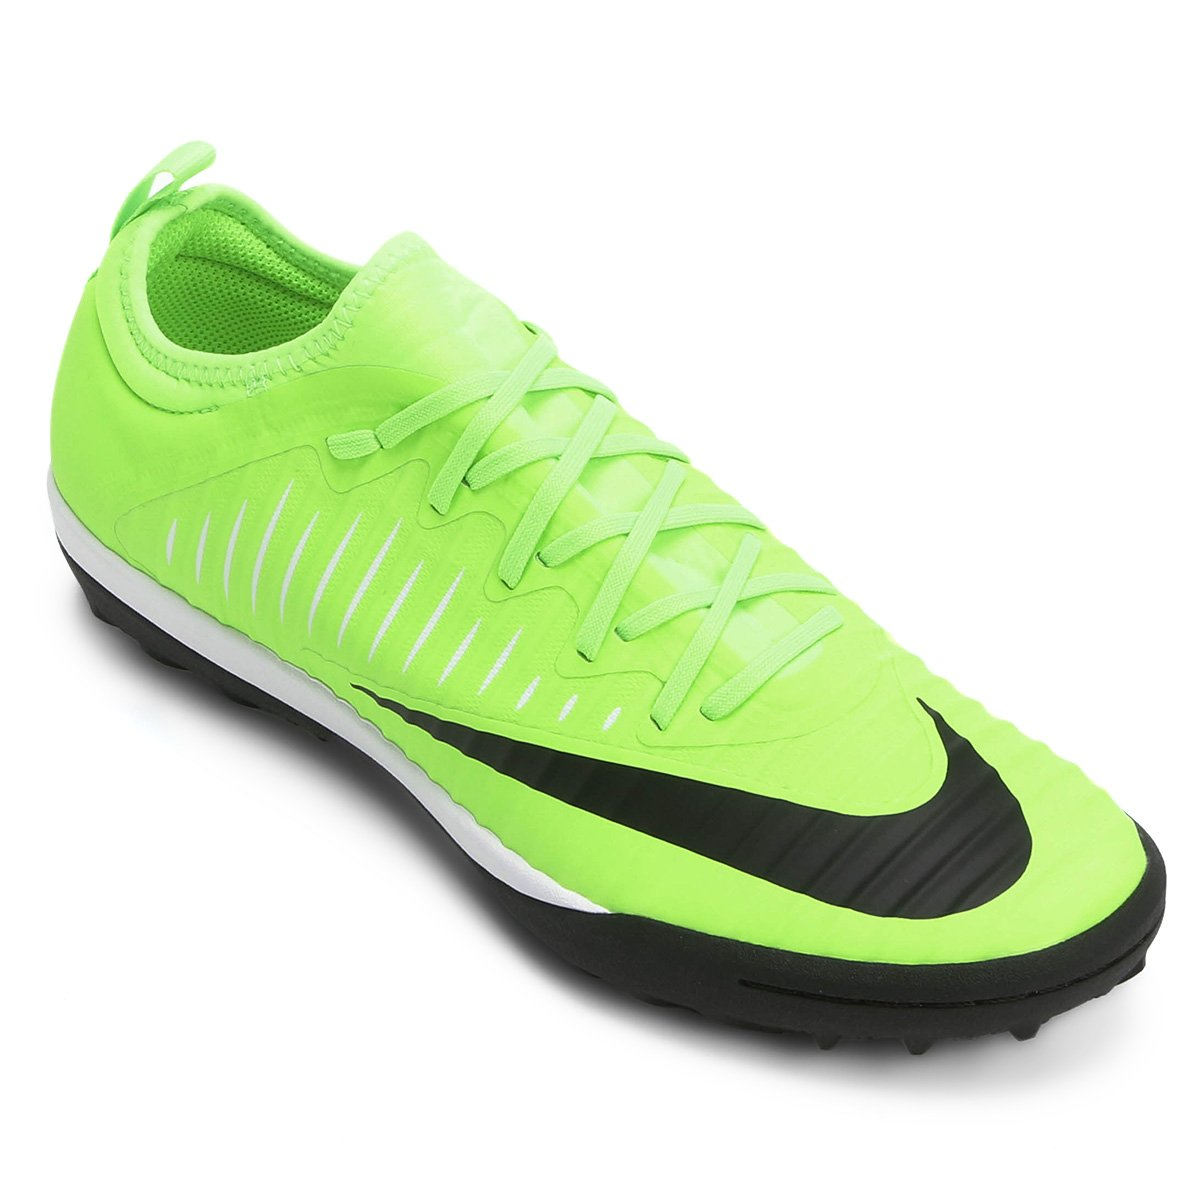 6d90ae6296 Chuteira Society Nike Mercurial Finale 2 TF Masculina - Verde e .